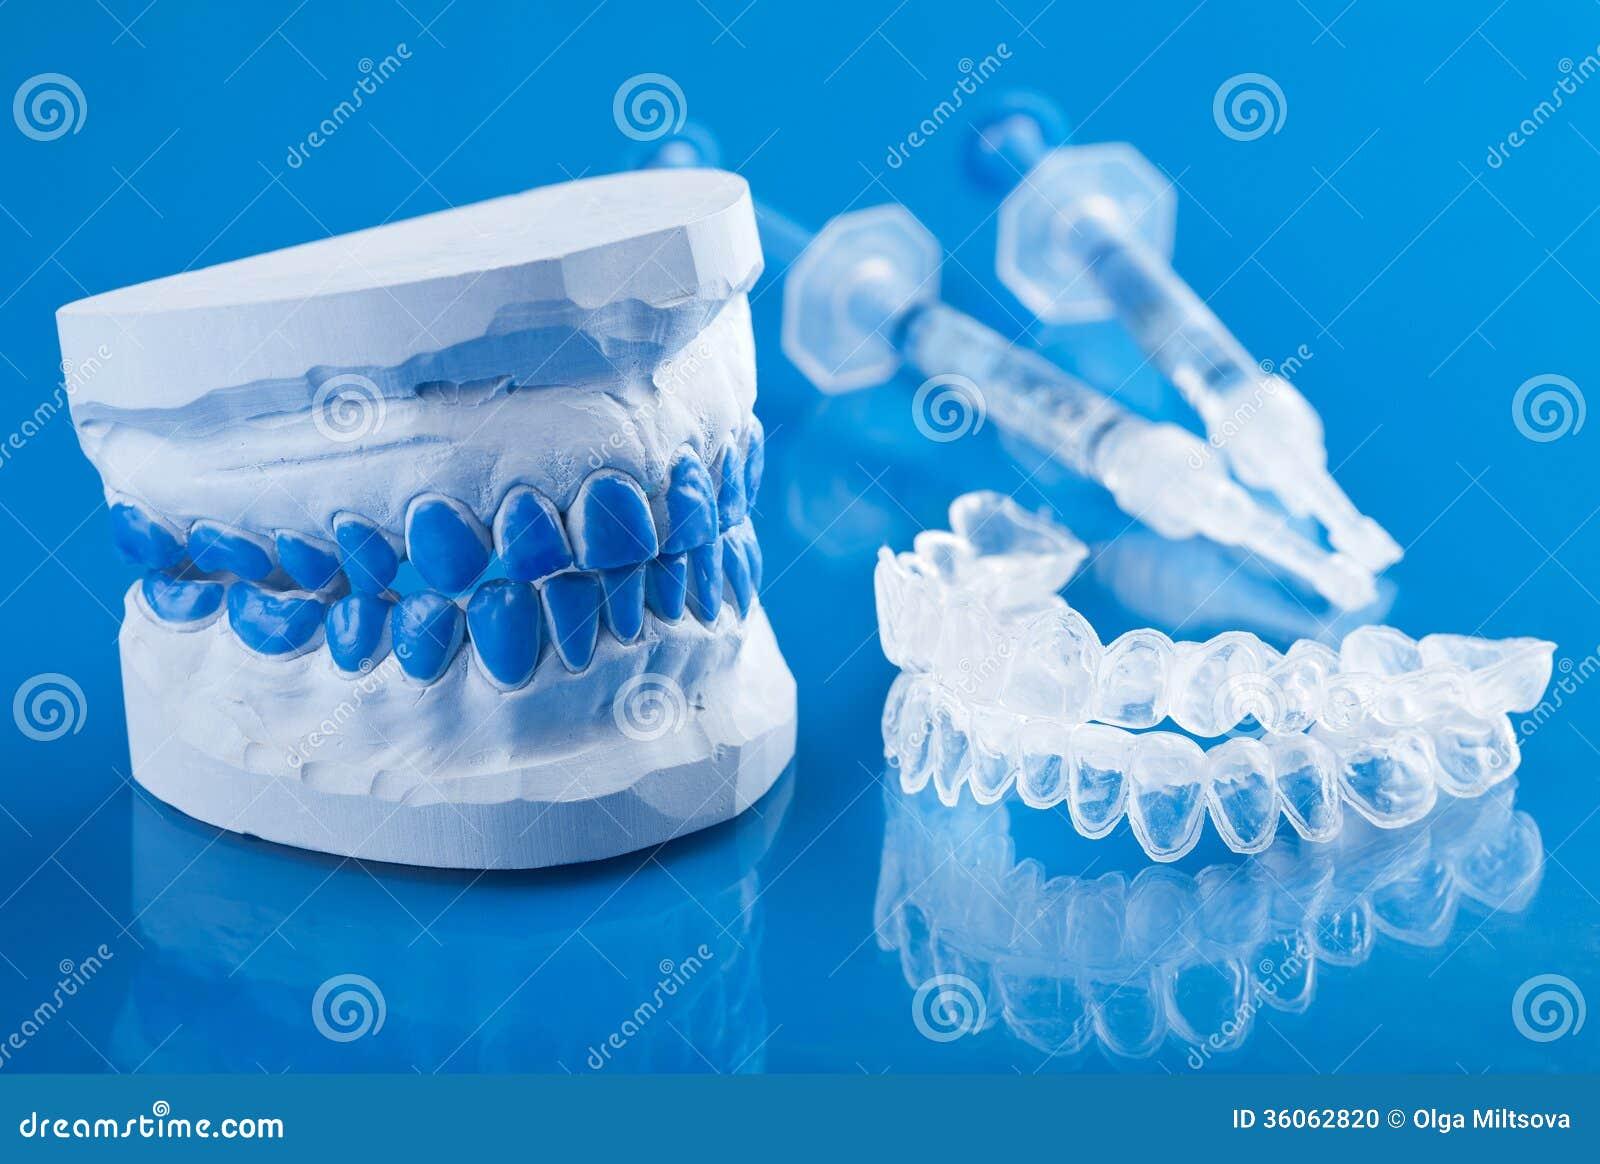 Deformacao Permanente Para Clarear Dos Dentes Foto De Stock Imagem